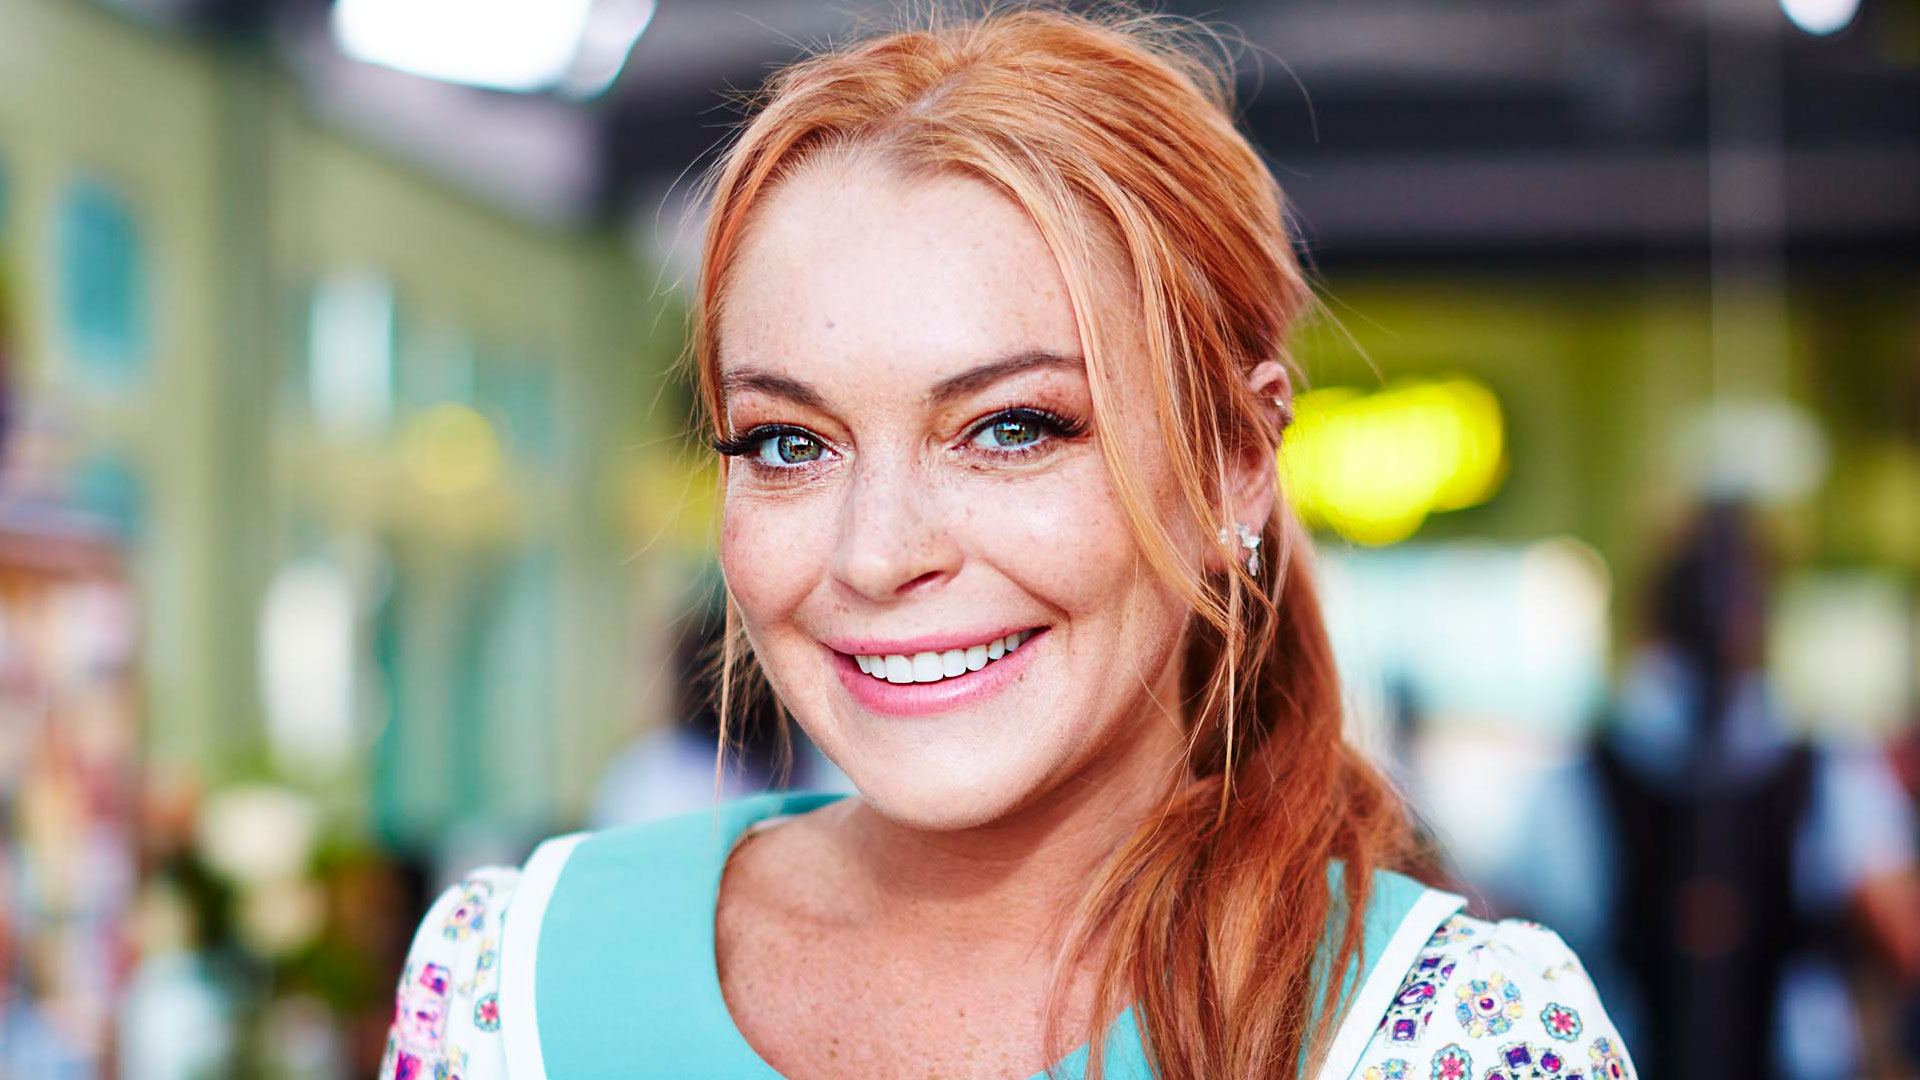 Lindsay Lohan, Venison, Spear Fishing